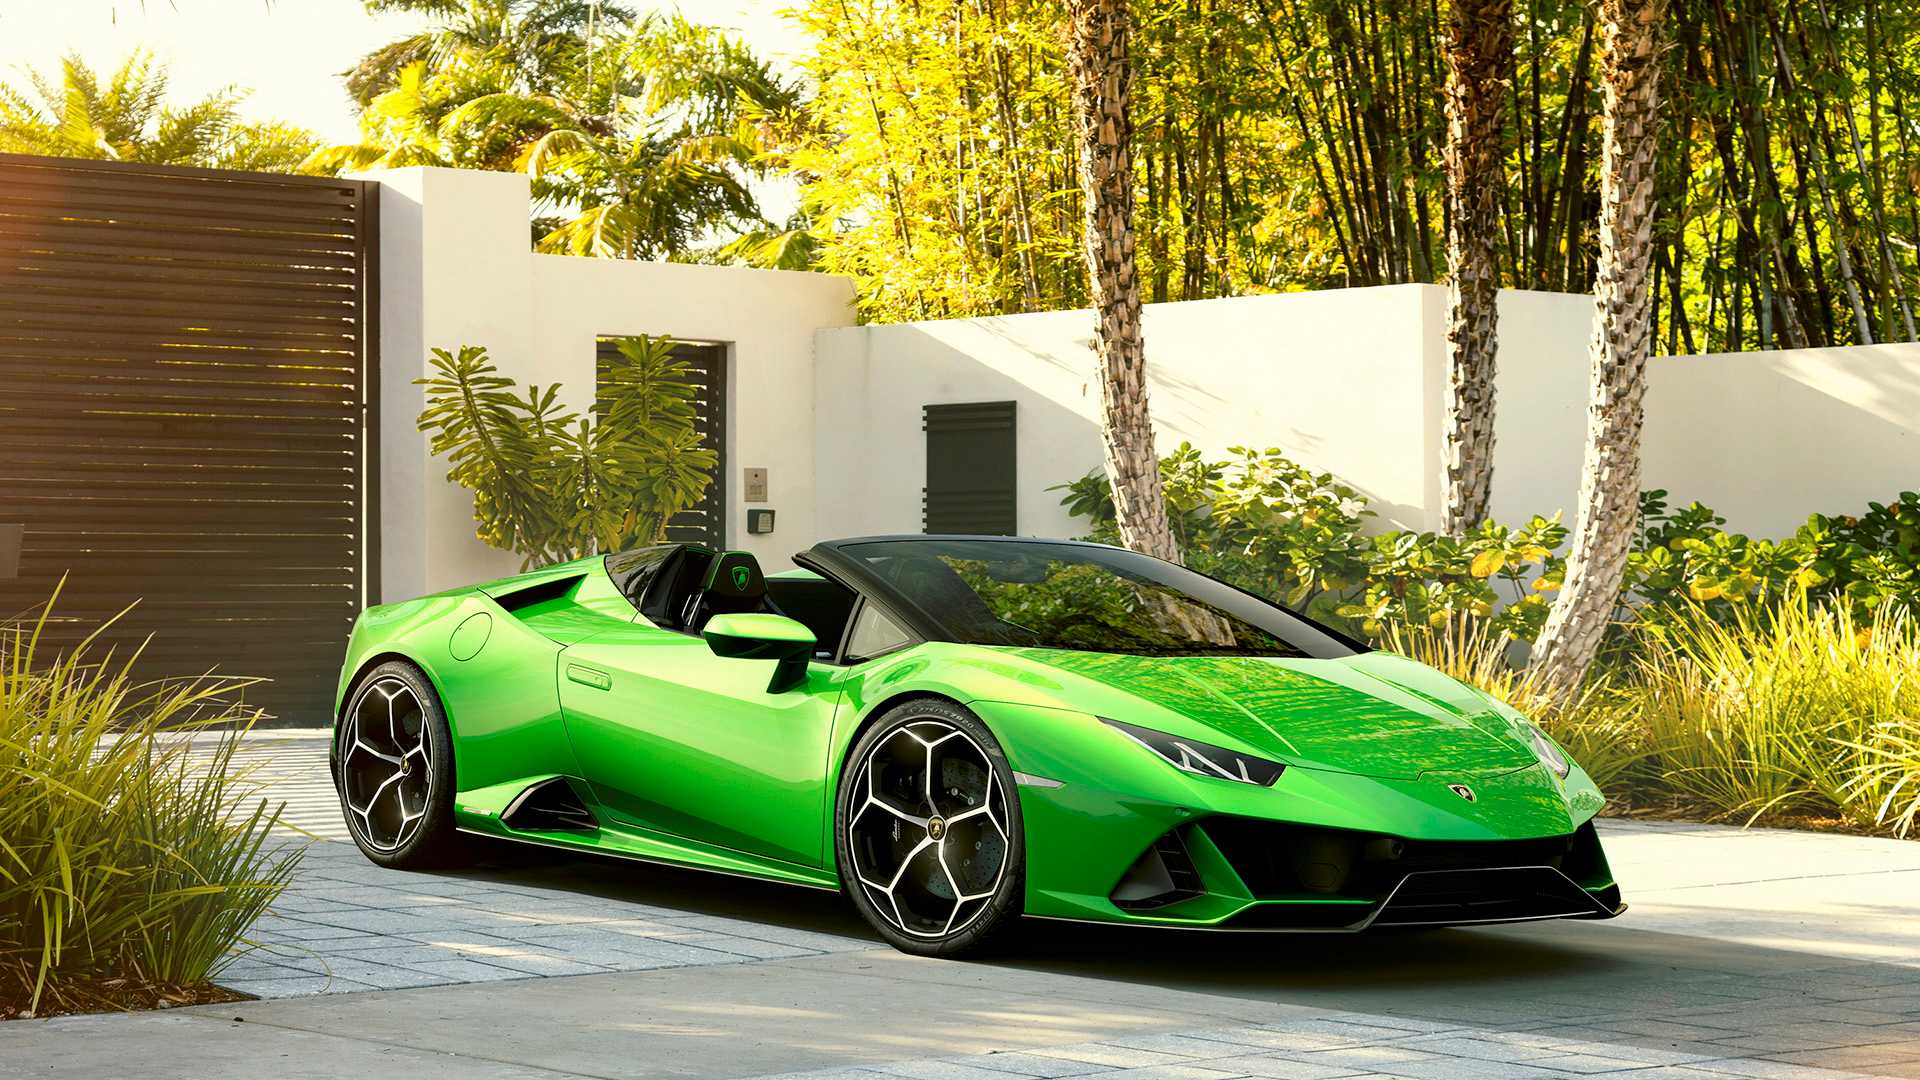 Lamborghini Huracan Evo Spyder Debuts Its Folding Roof In Geneva